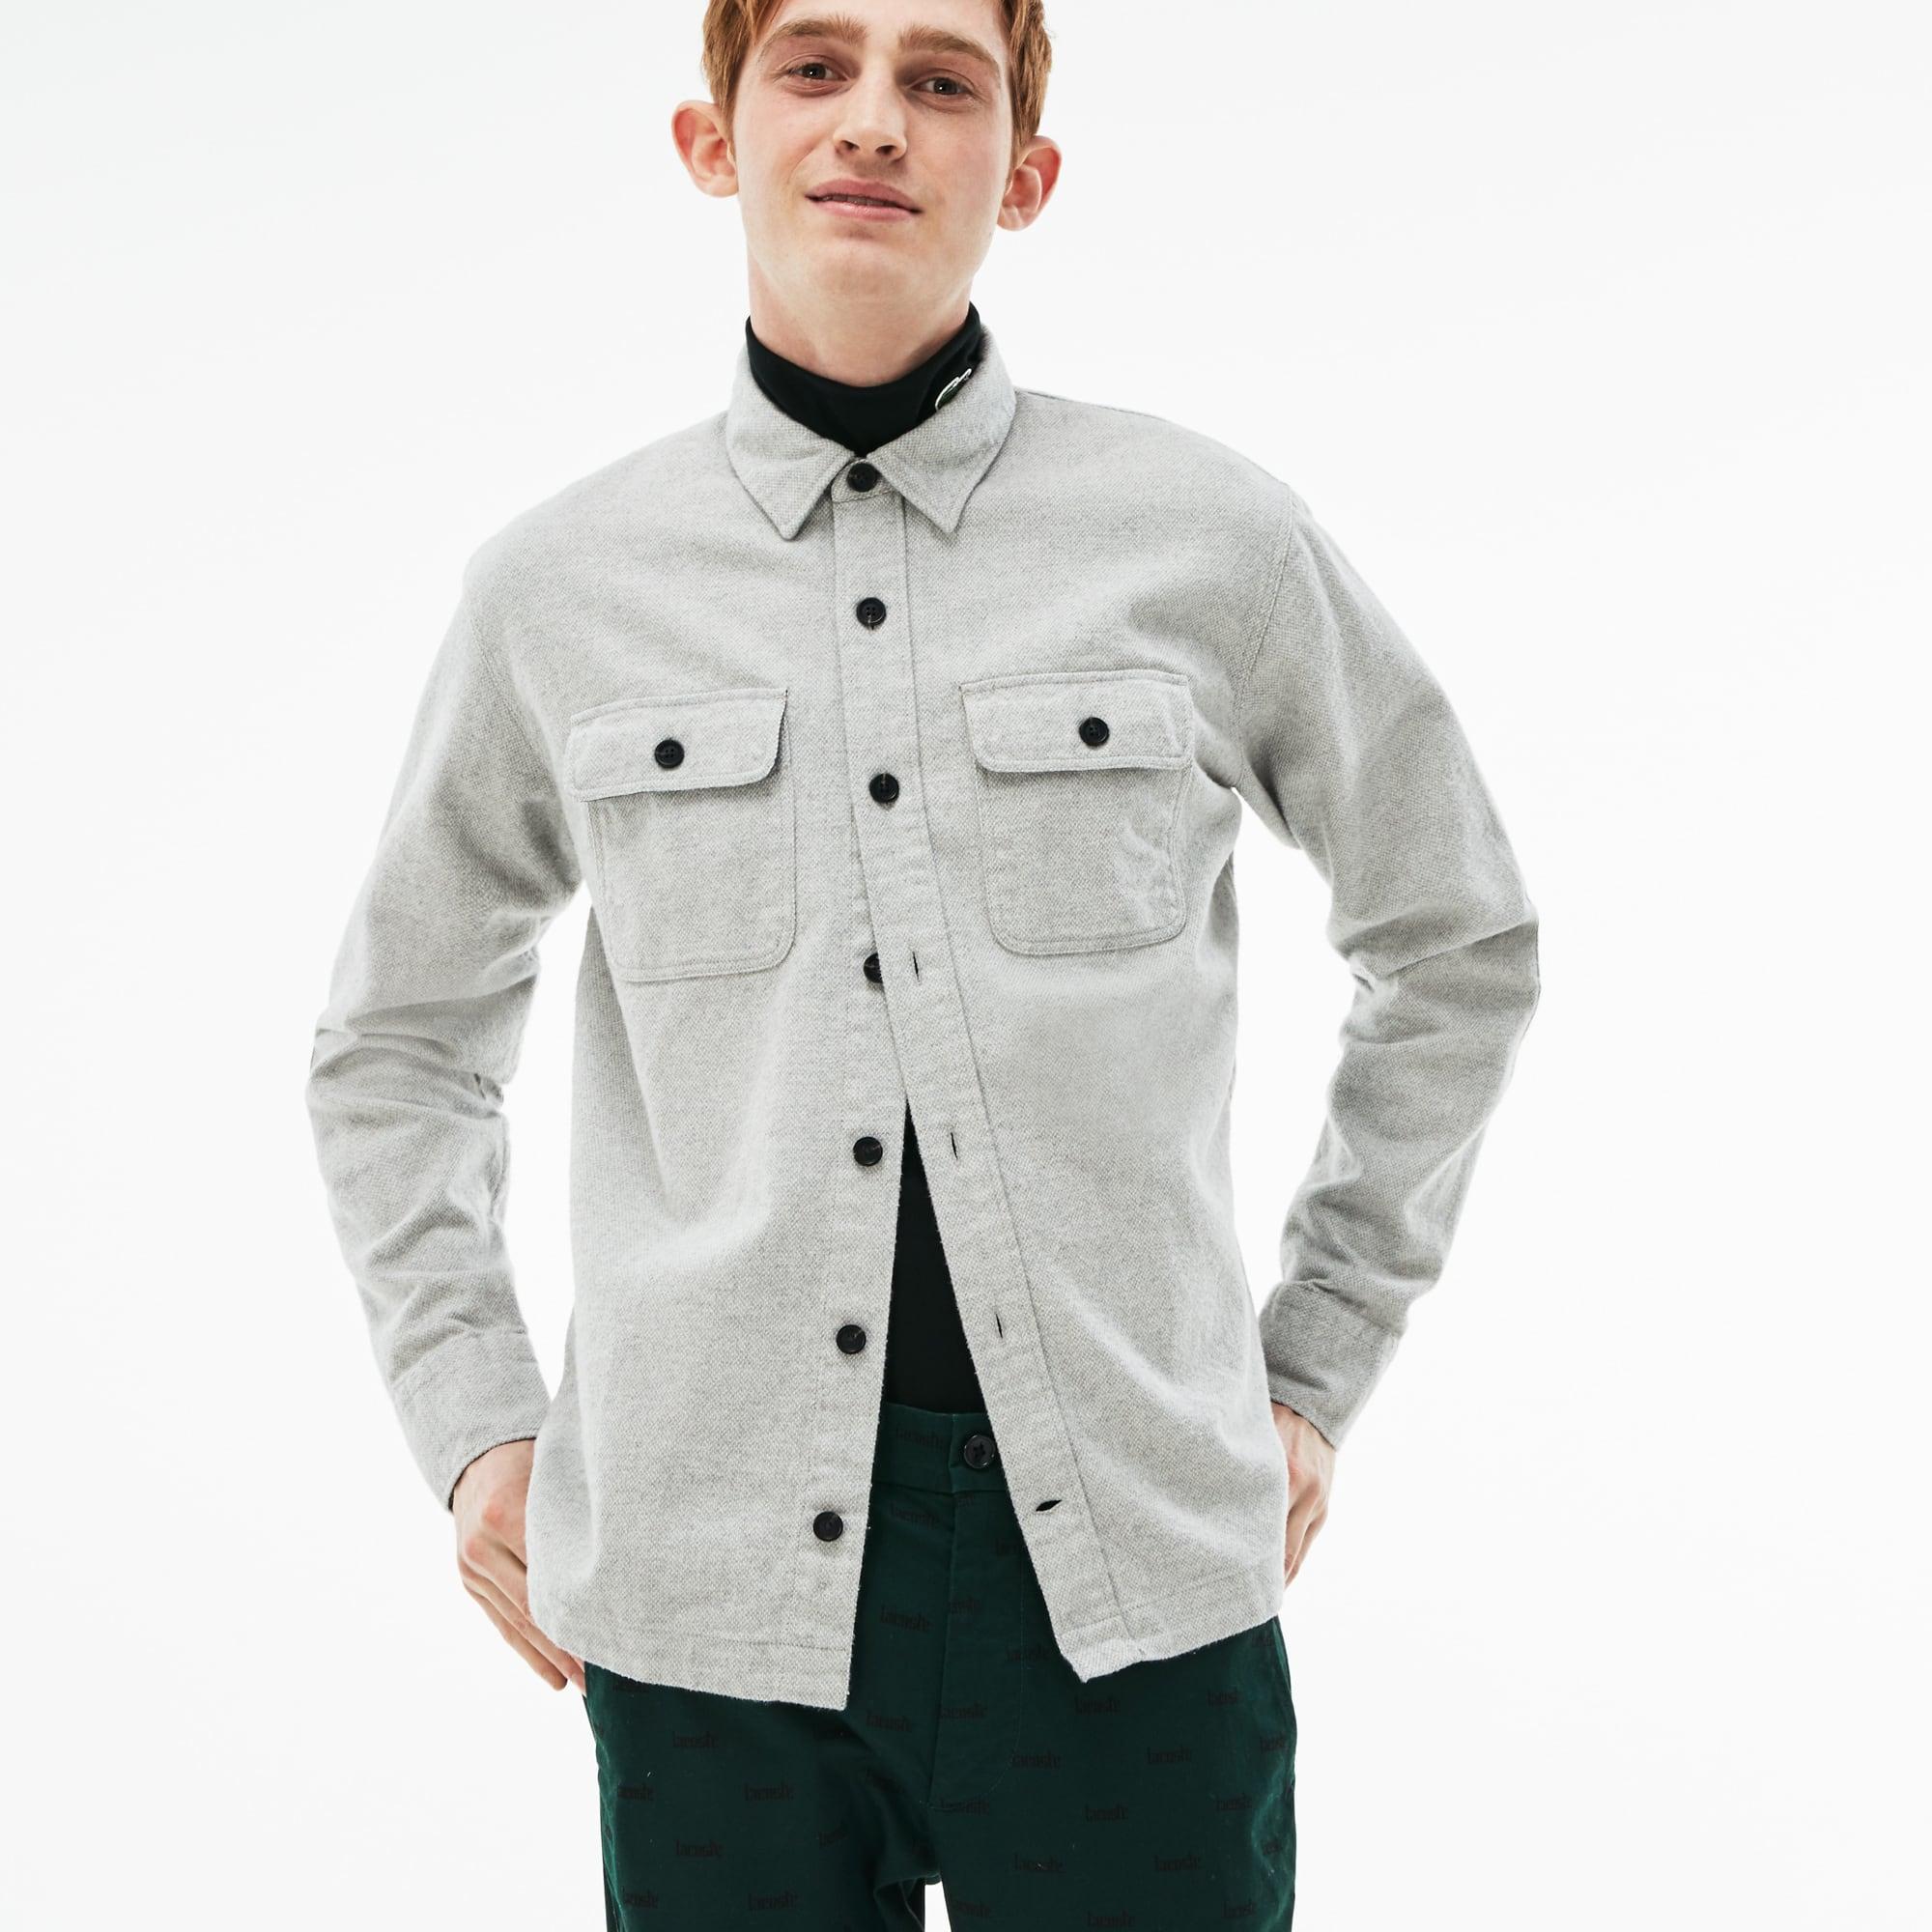 Camisa de hombre Lacoste LIVE boxy fit en franela de algodón